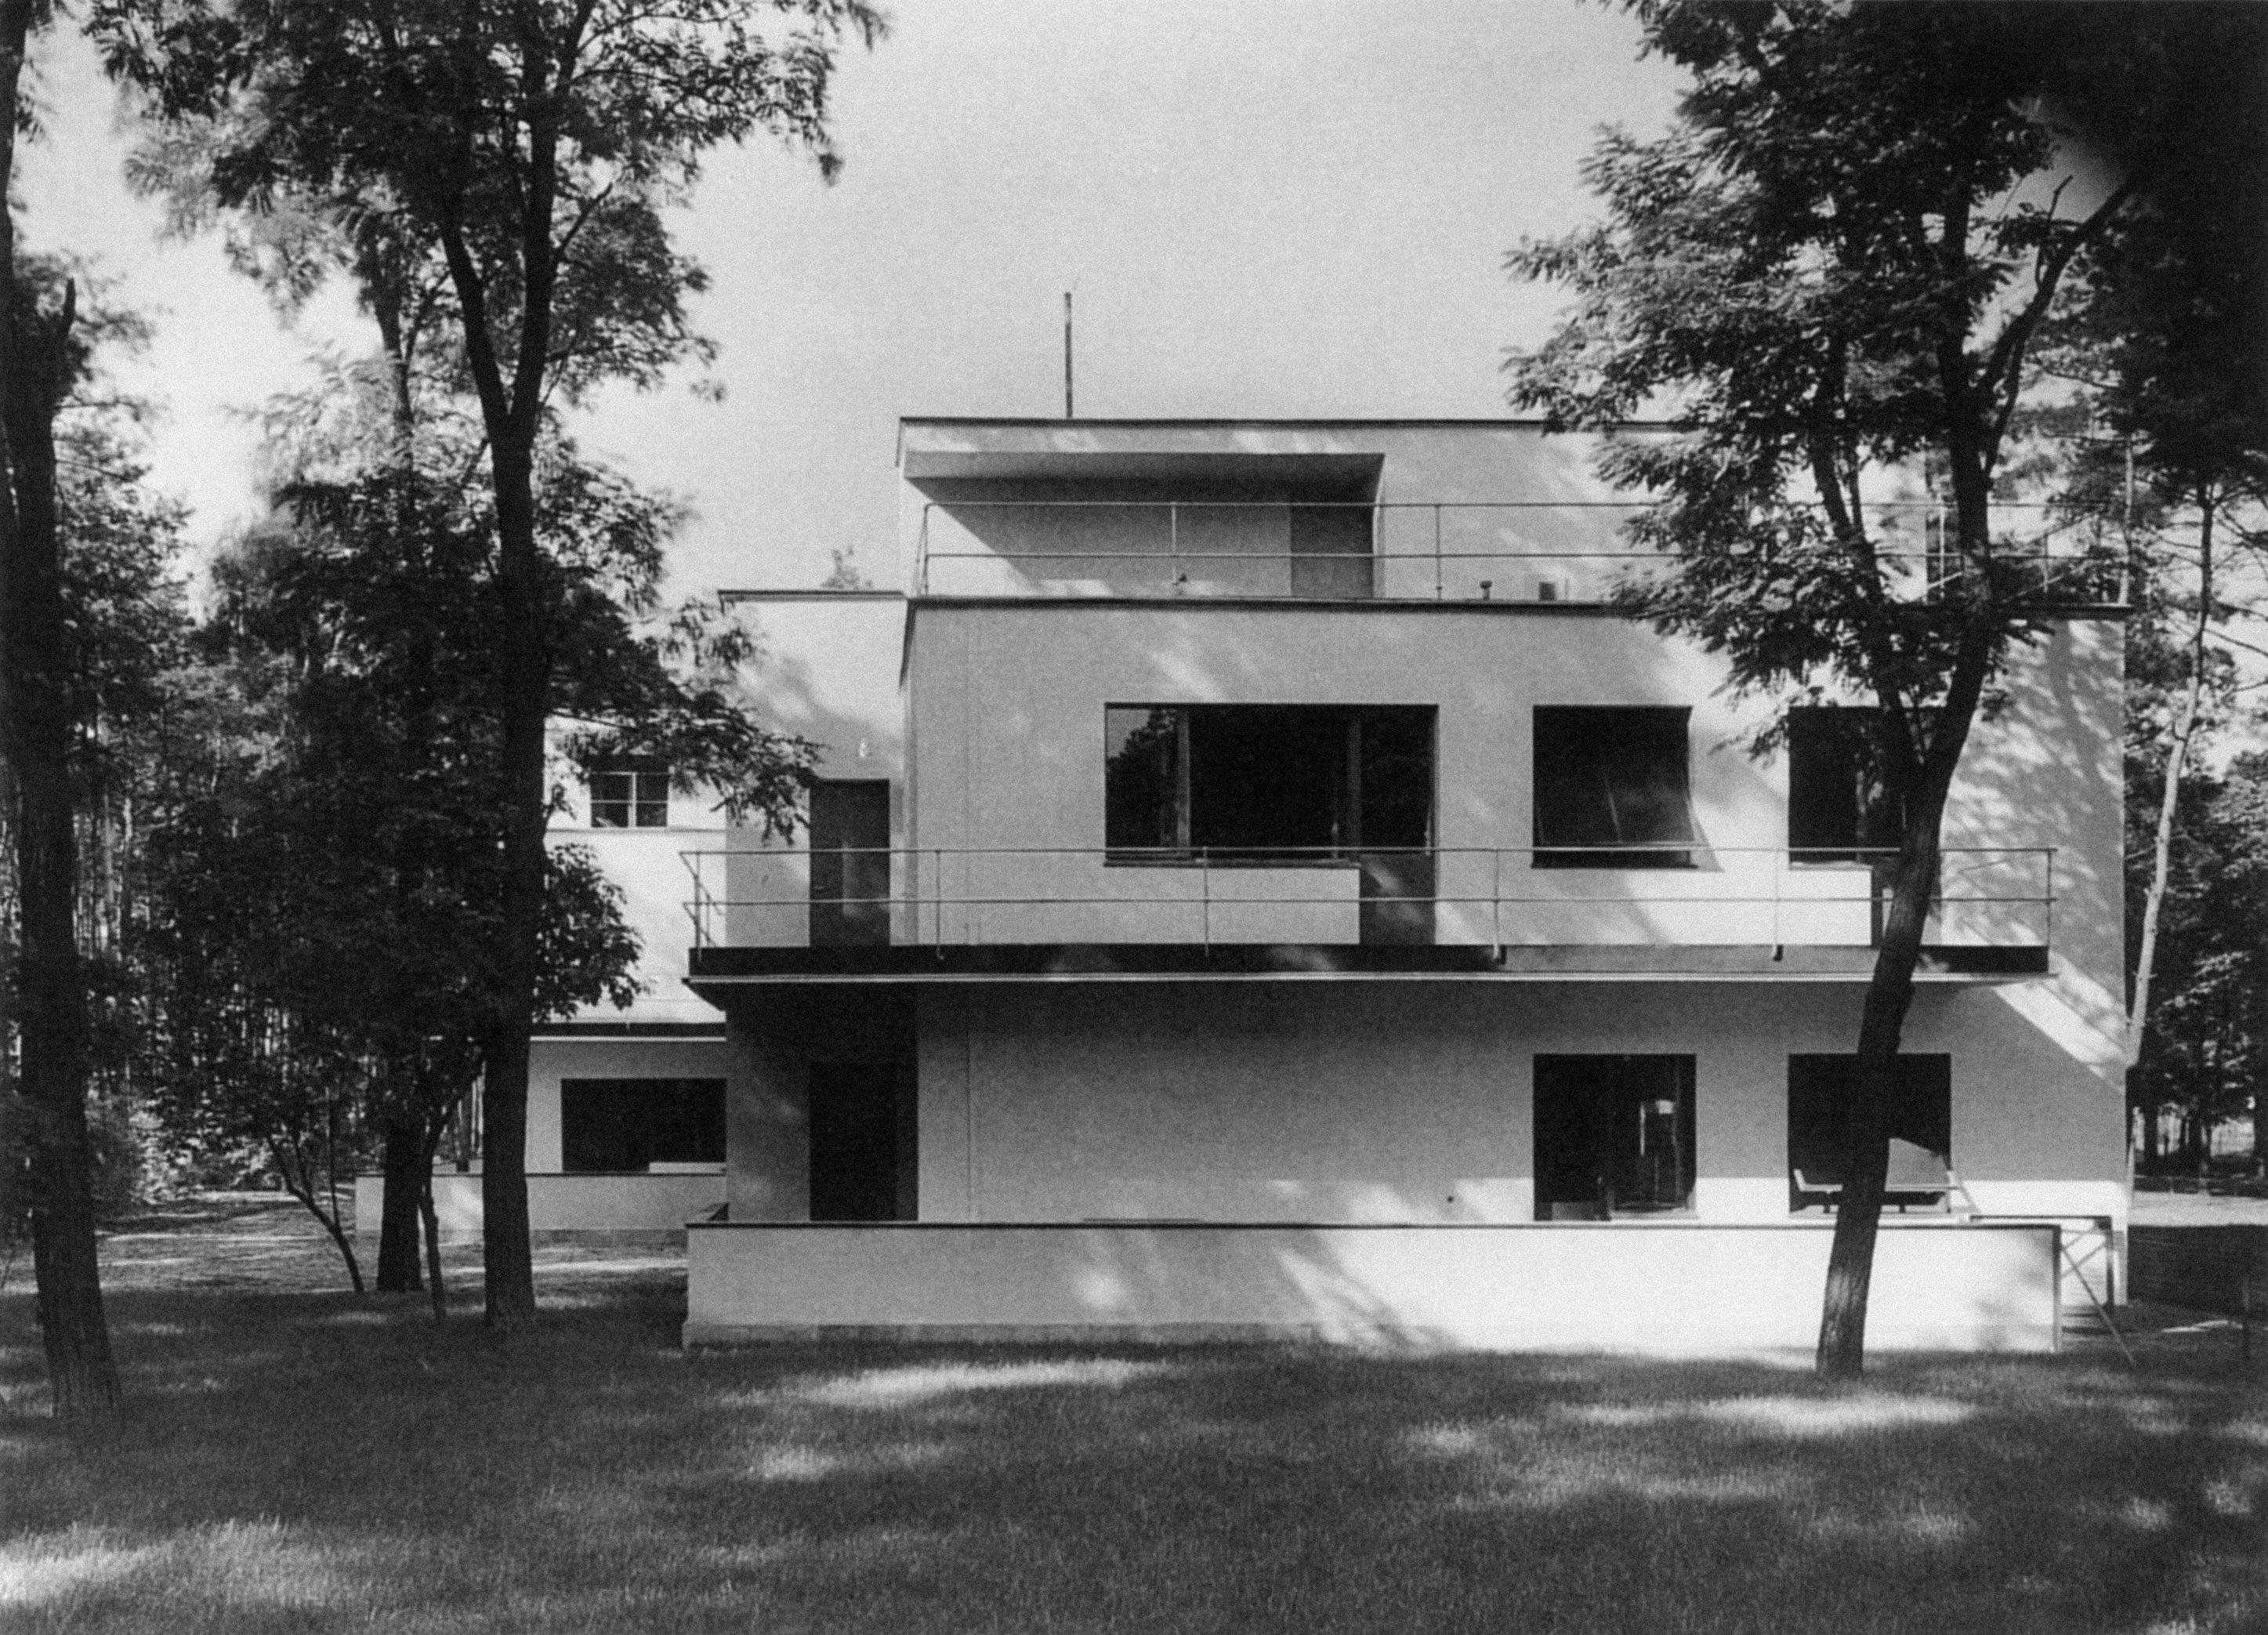 Lucia Moholy - Casa dei maestri del Bauhaus - Dessau, 1926 - Max museo, Chiasso